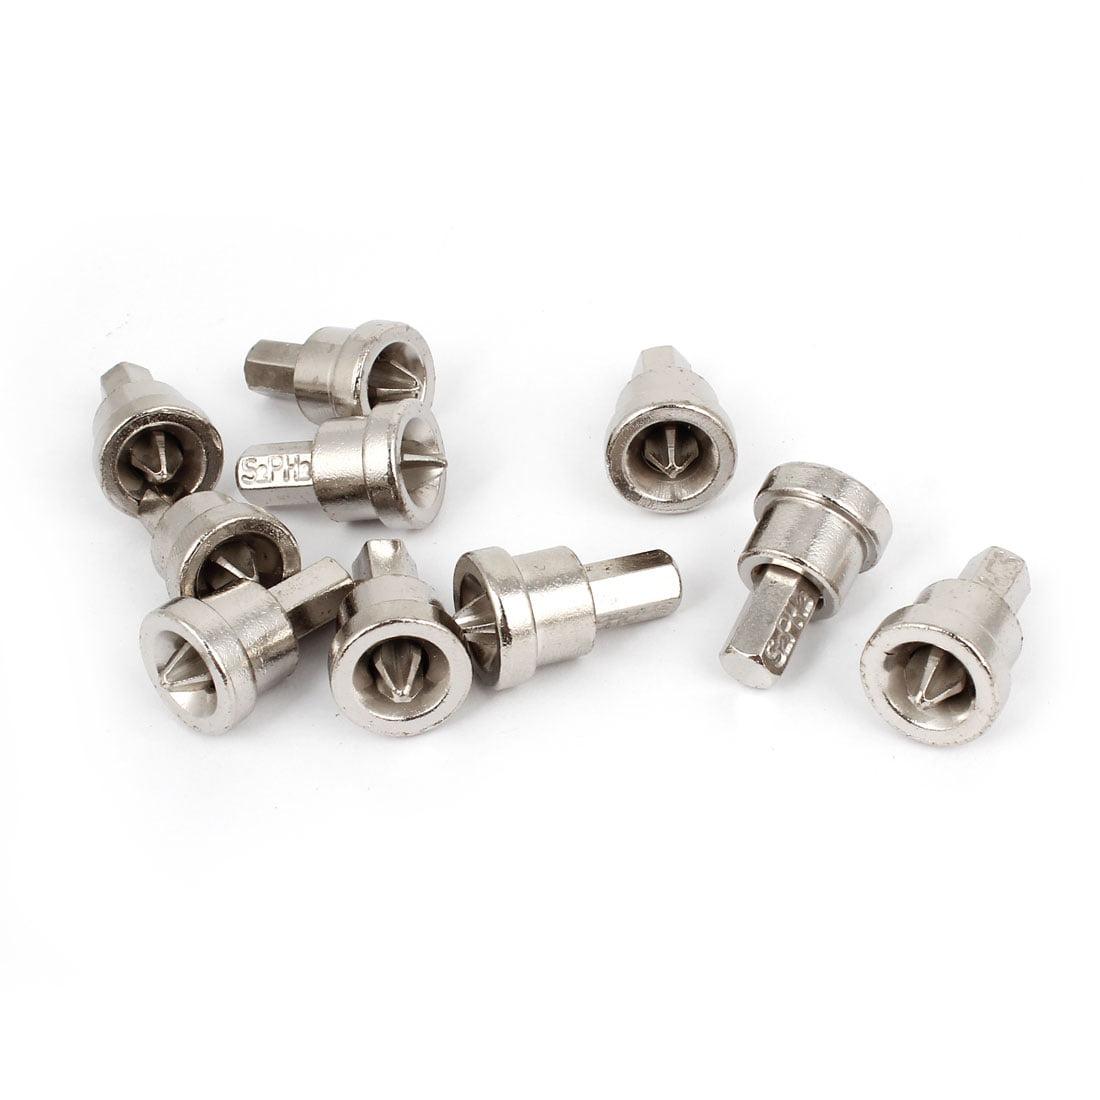 6mm PH2  Hex Shank Dimpler Drill Bit Drywall Screw 10 Pcs